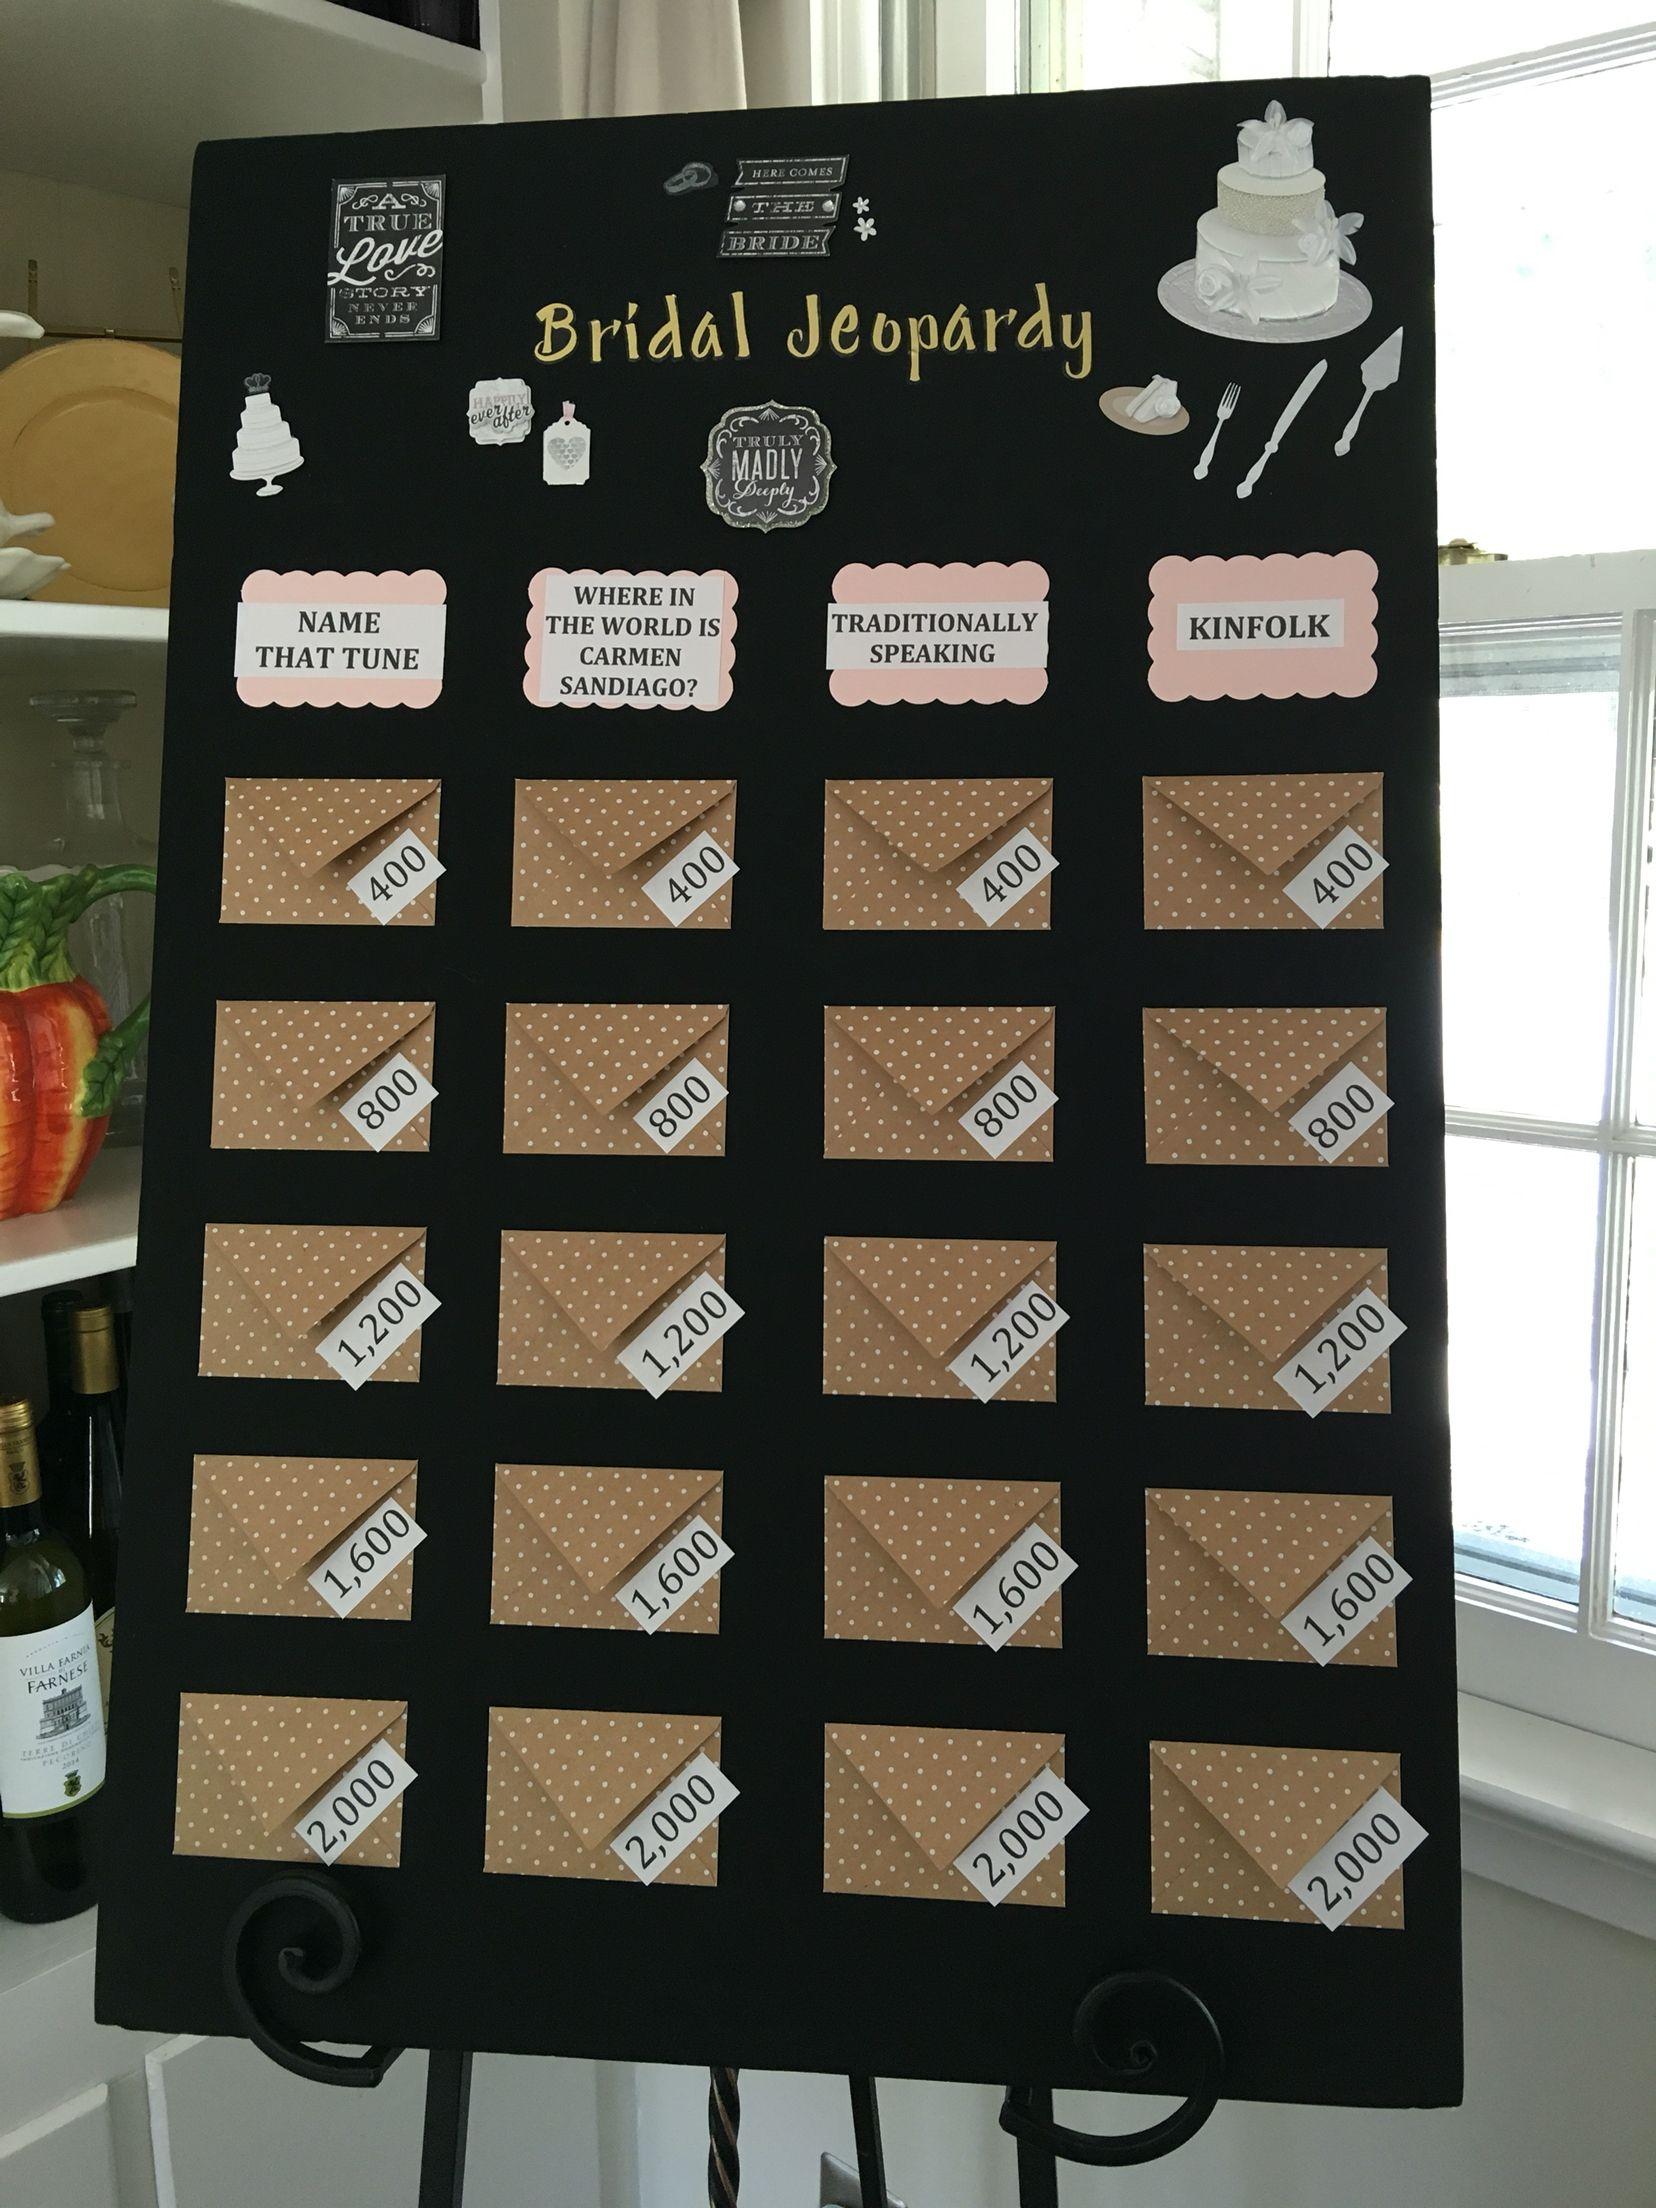 Bridal jeopardy so much fun More